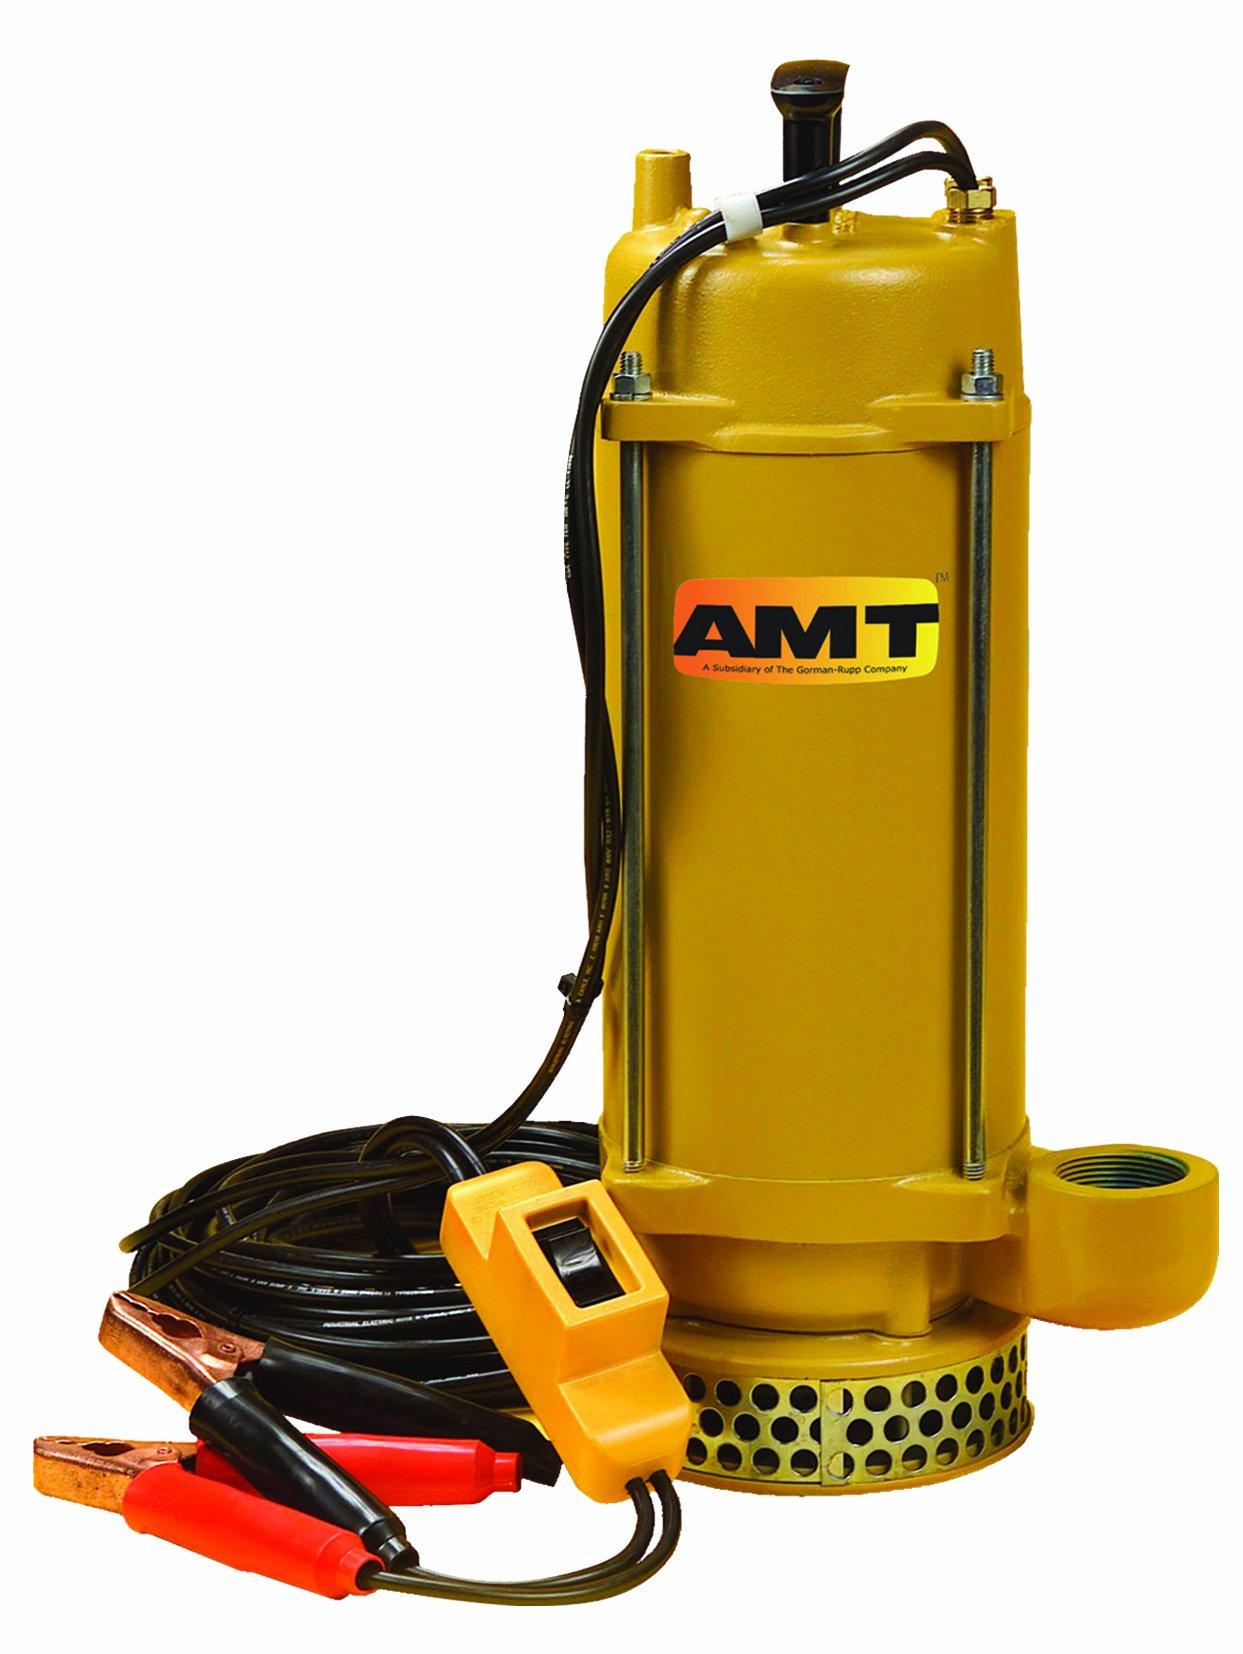 AMT Pump 5890-DC Submersible Pump, Aluminum, 1/3 HP, 12V, 1-1/2'' NPT Female Discharge Port